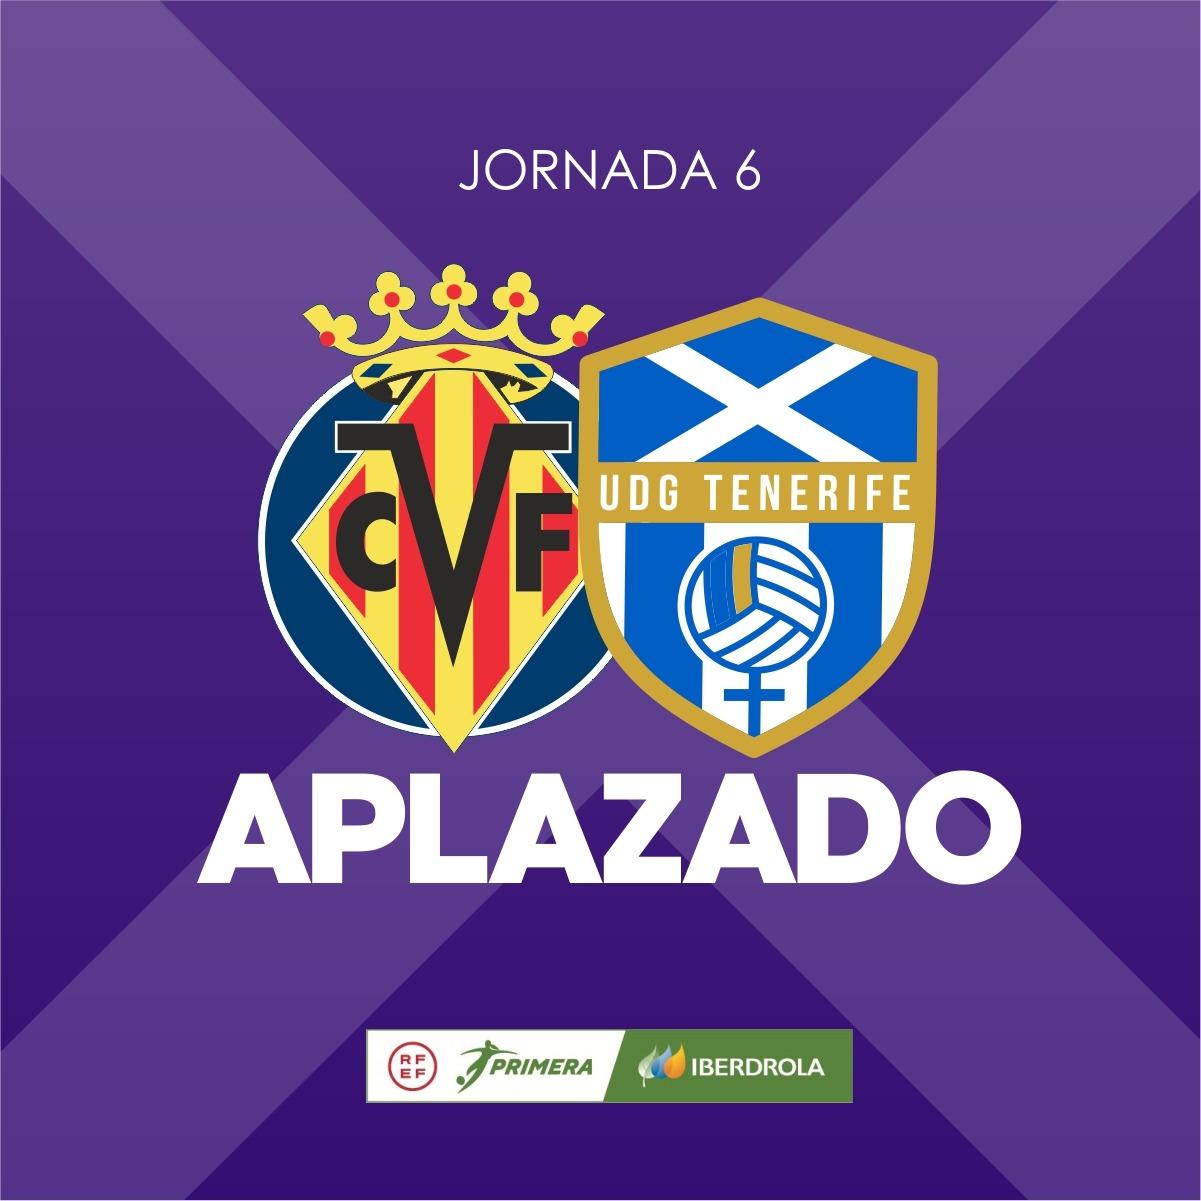 El Villarreal CF - UDG Tenerife, aplazado